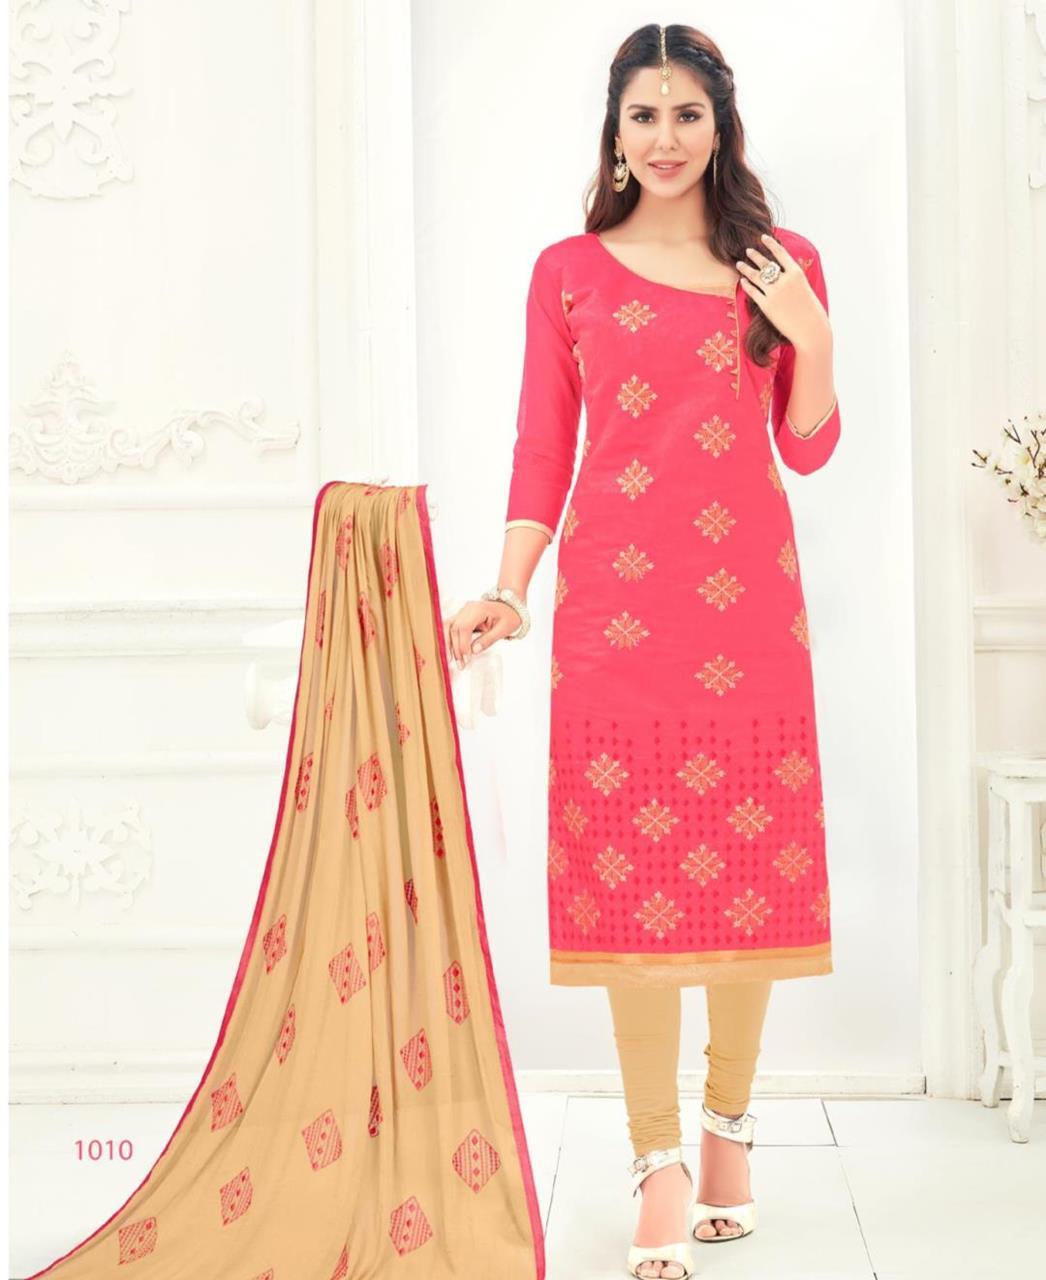 Embroidered Chanderi Pink Straight Cut Salwar Kameez